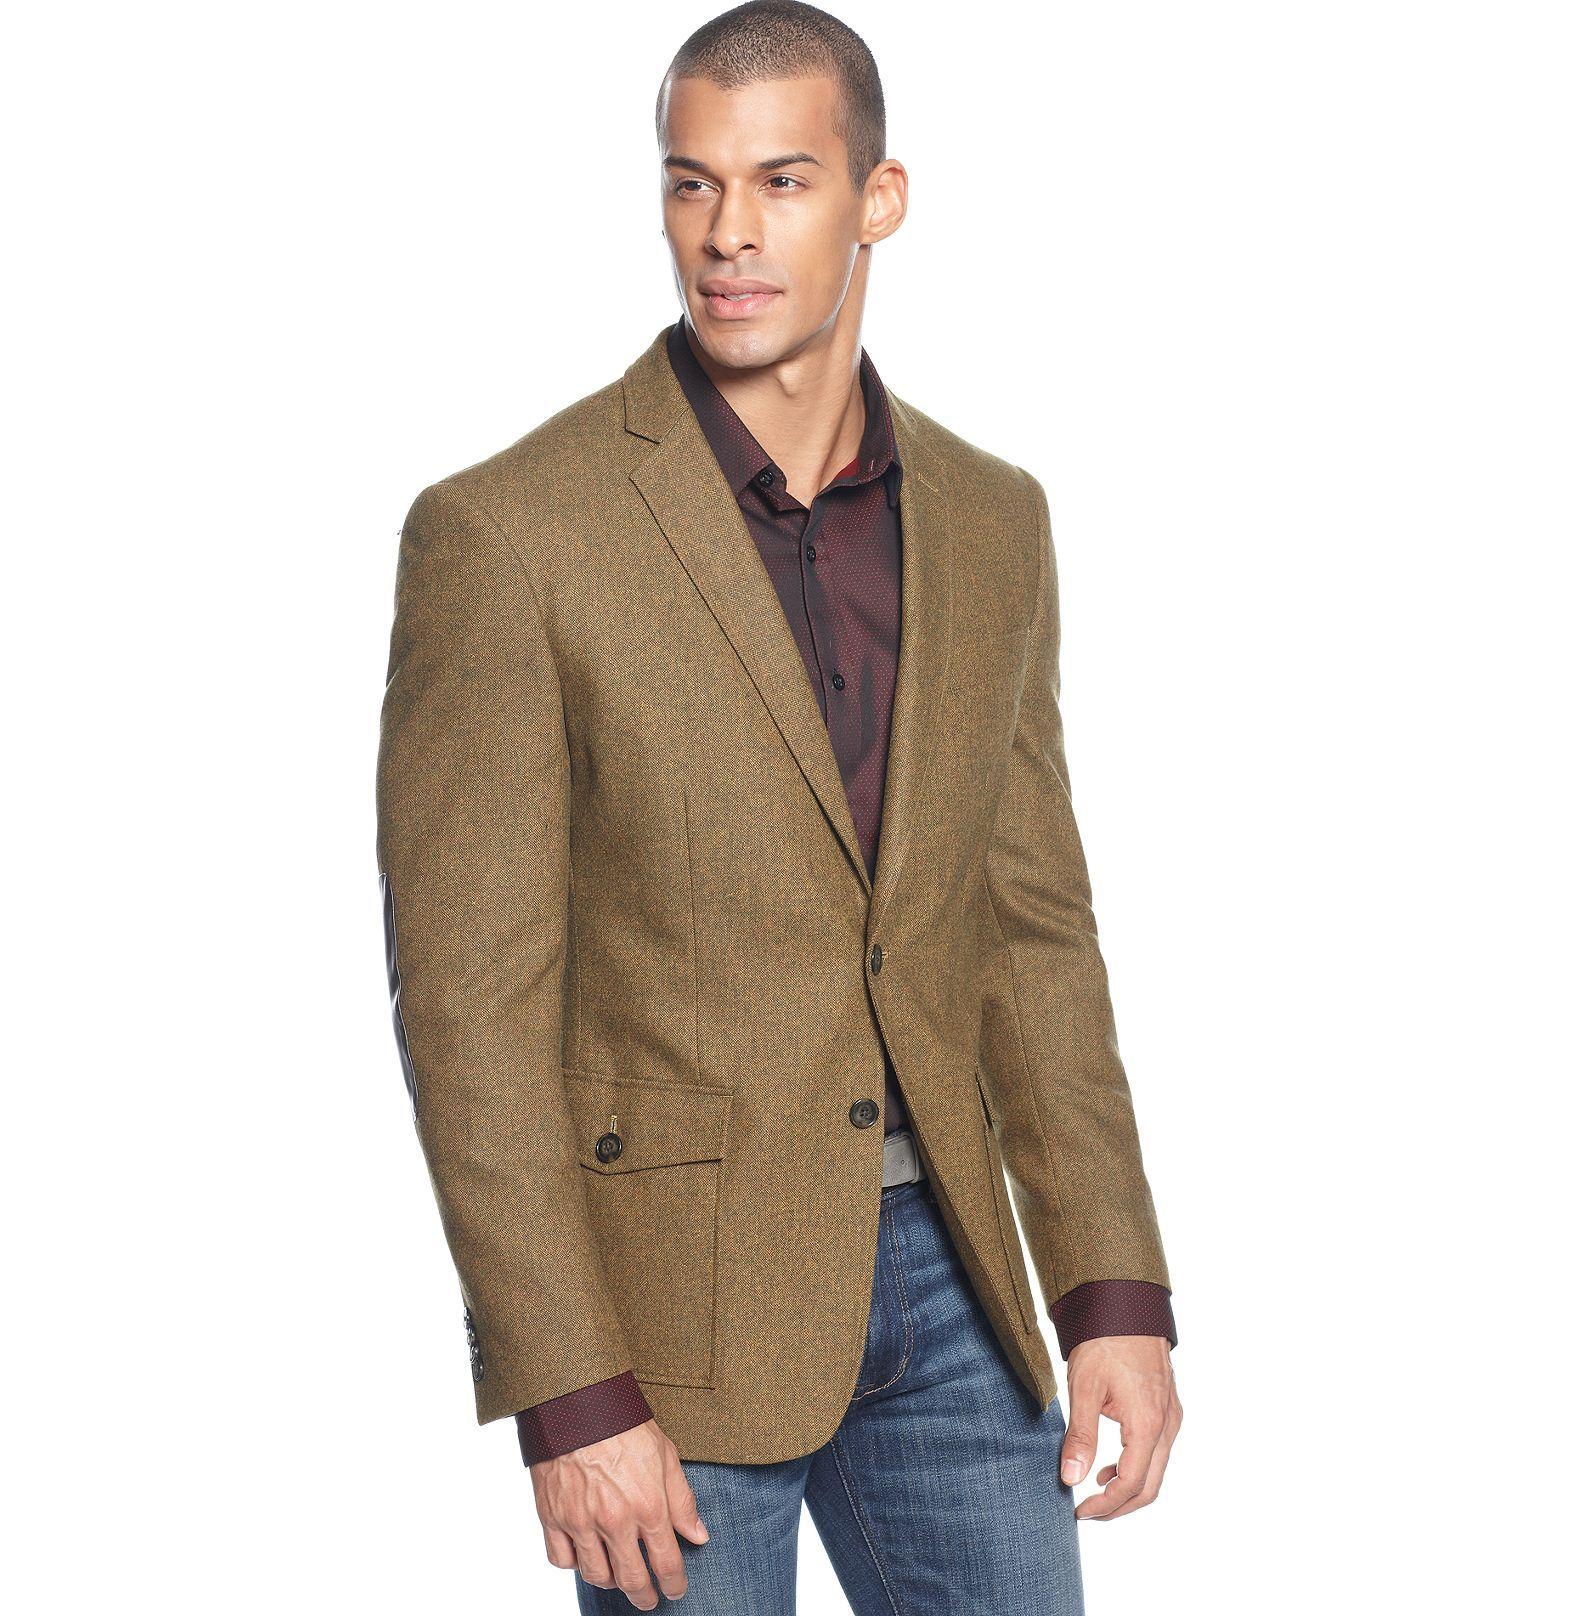 Sean John Jacket, Tweed Blazer with Elbow Patches - Blazers ...